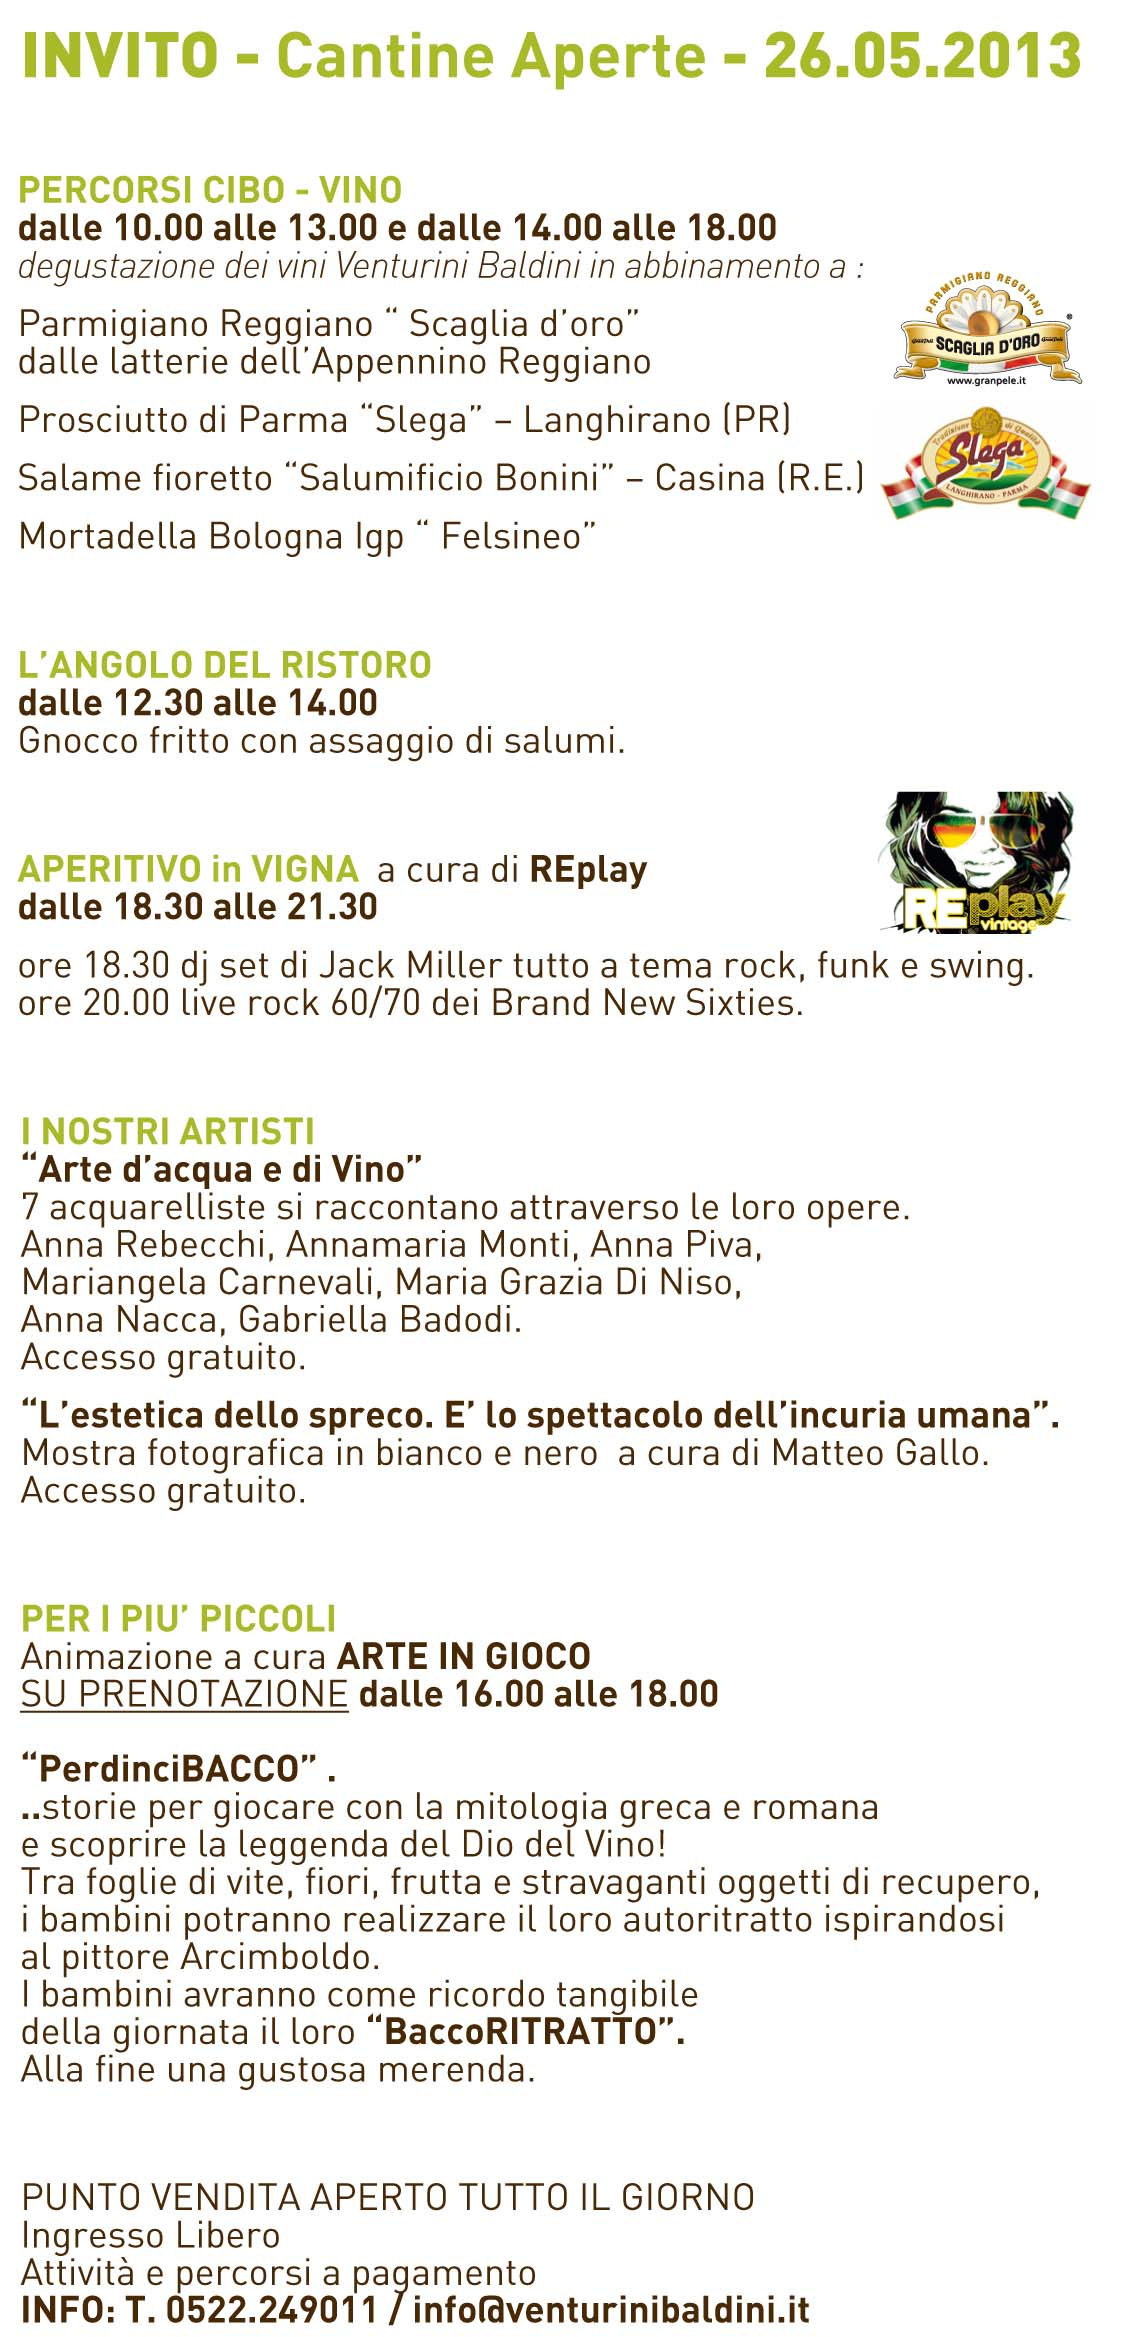 Cantine Aperte 2013 Venturini Baldini-2